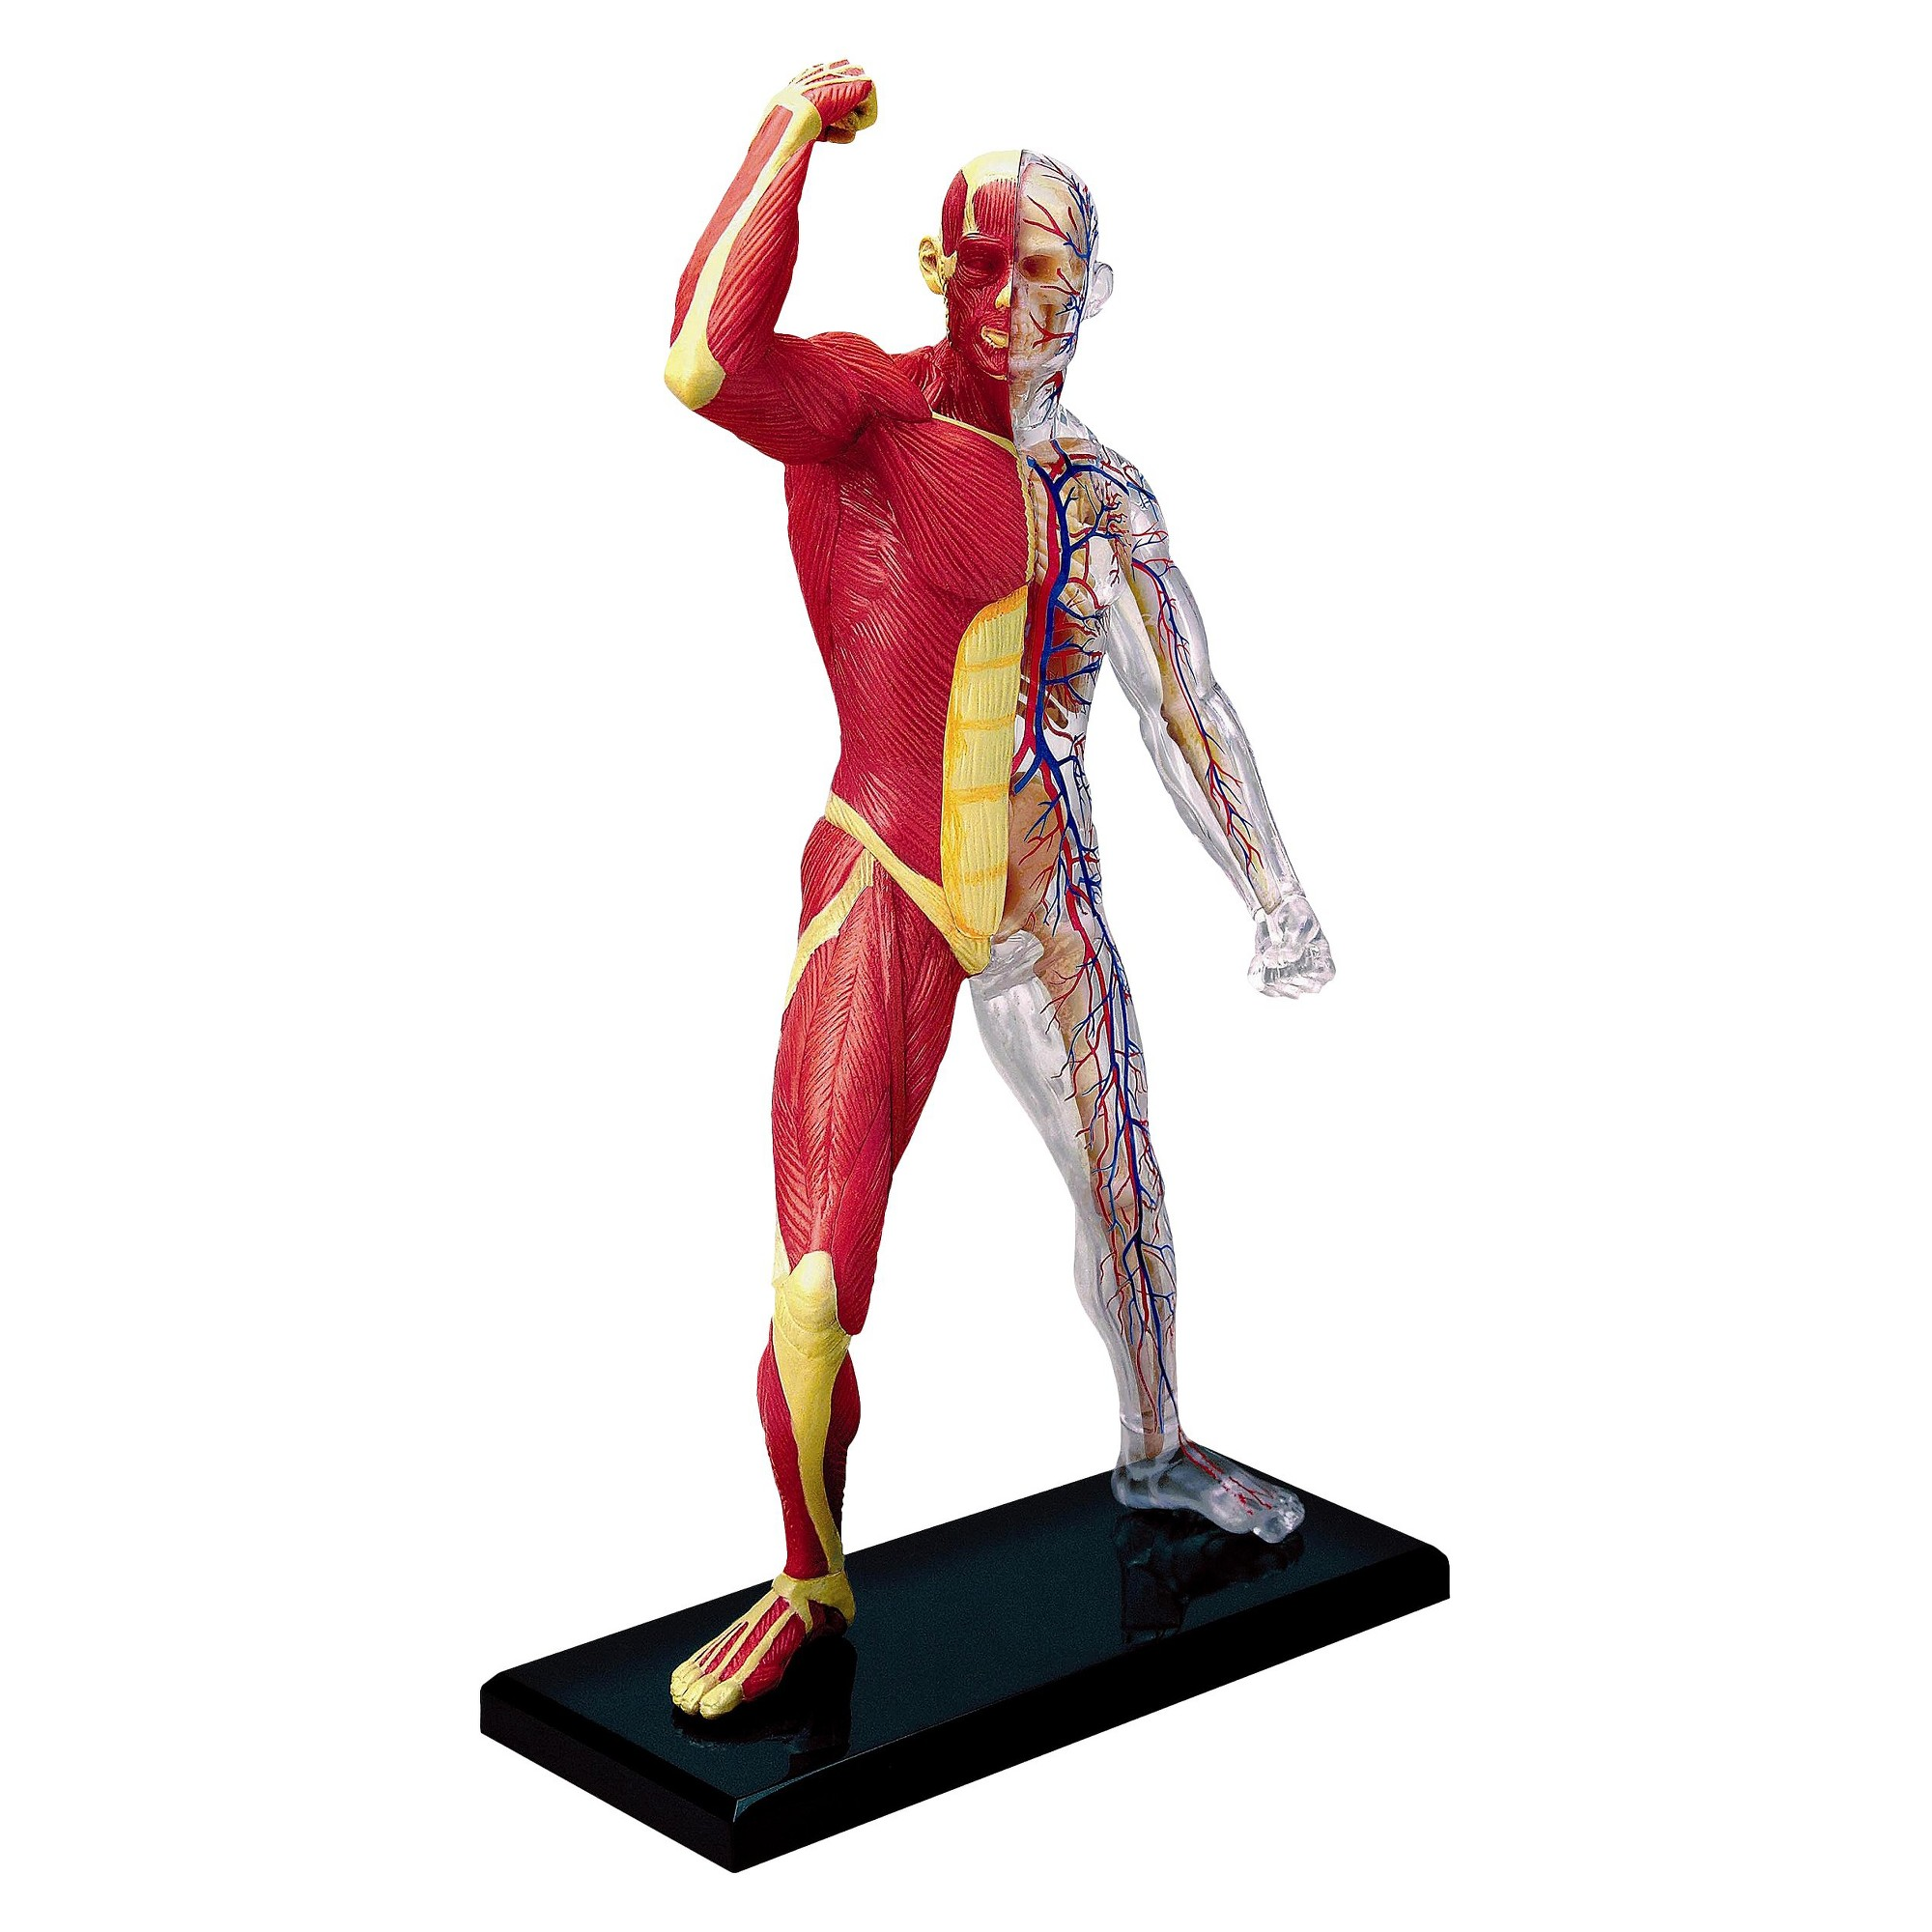 4D Master Human Muscle & Skeleton Anatomy Model 46pc | Pinterest ...